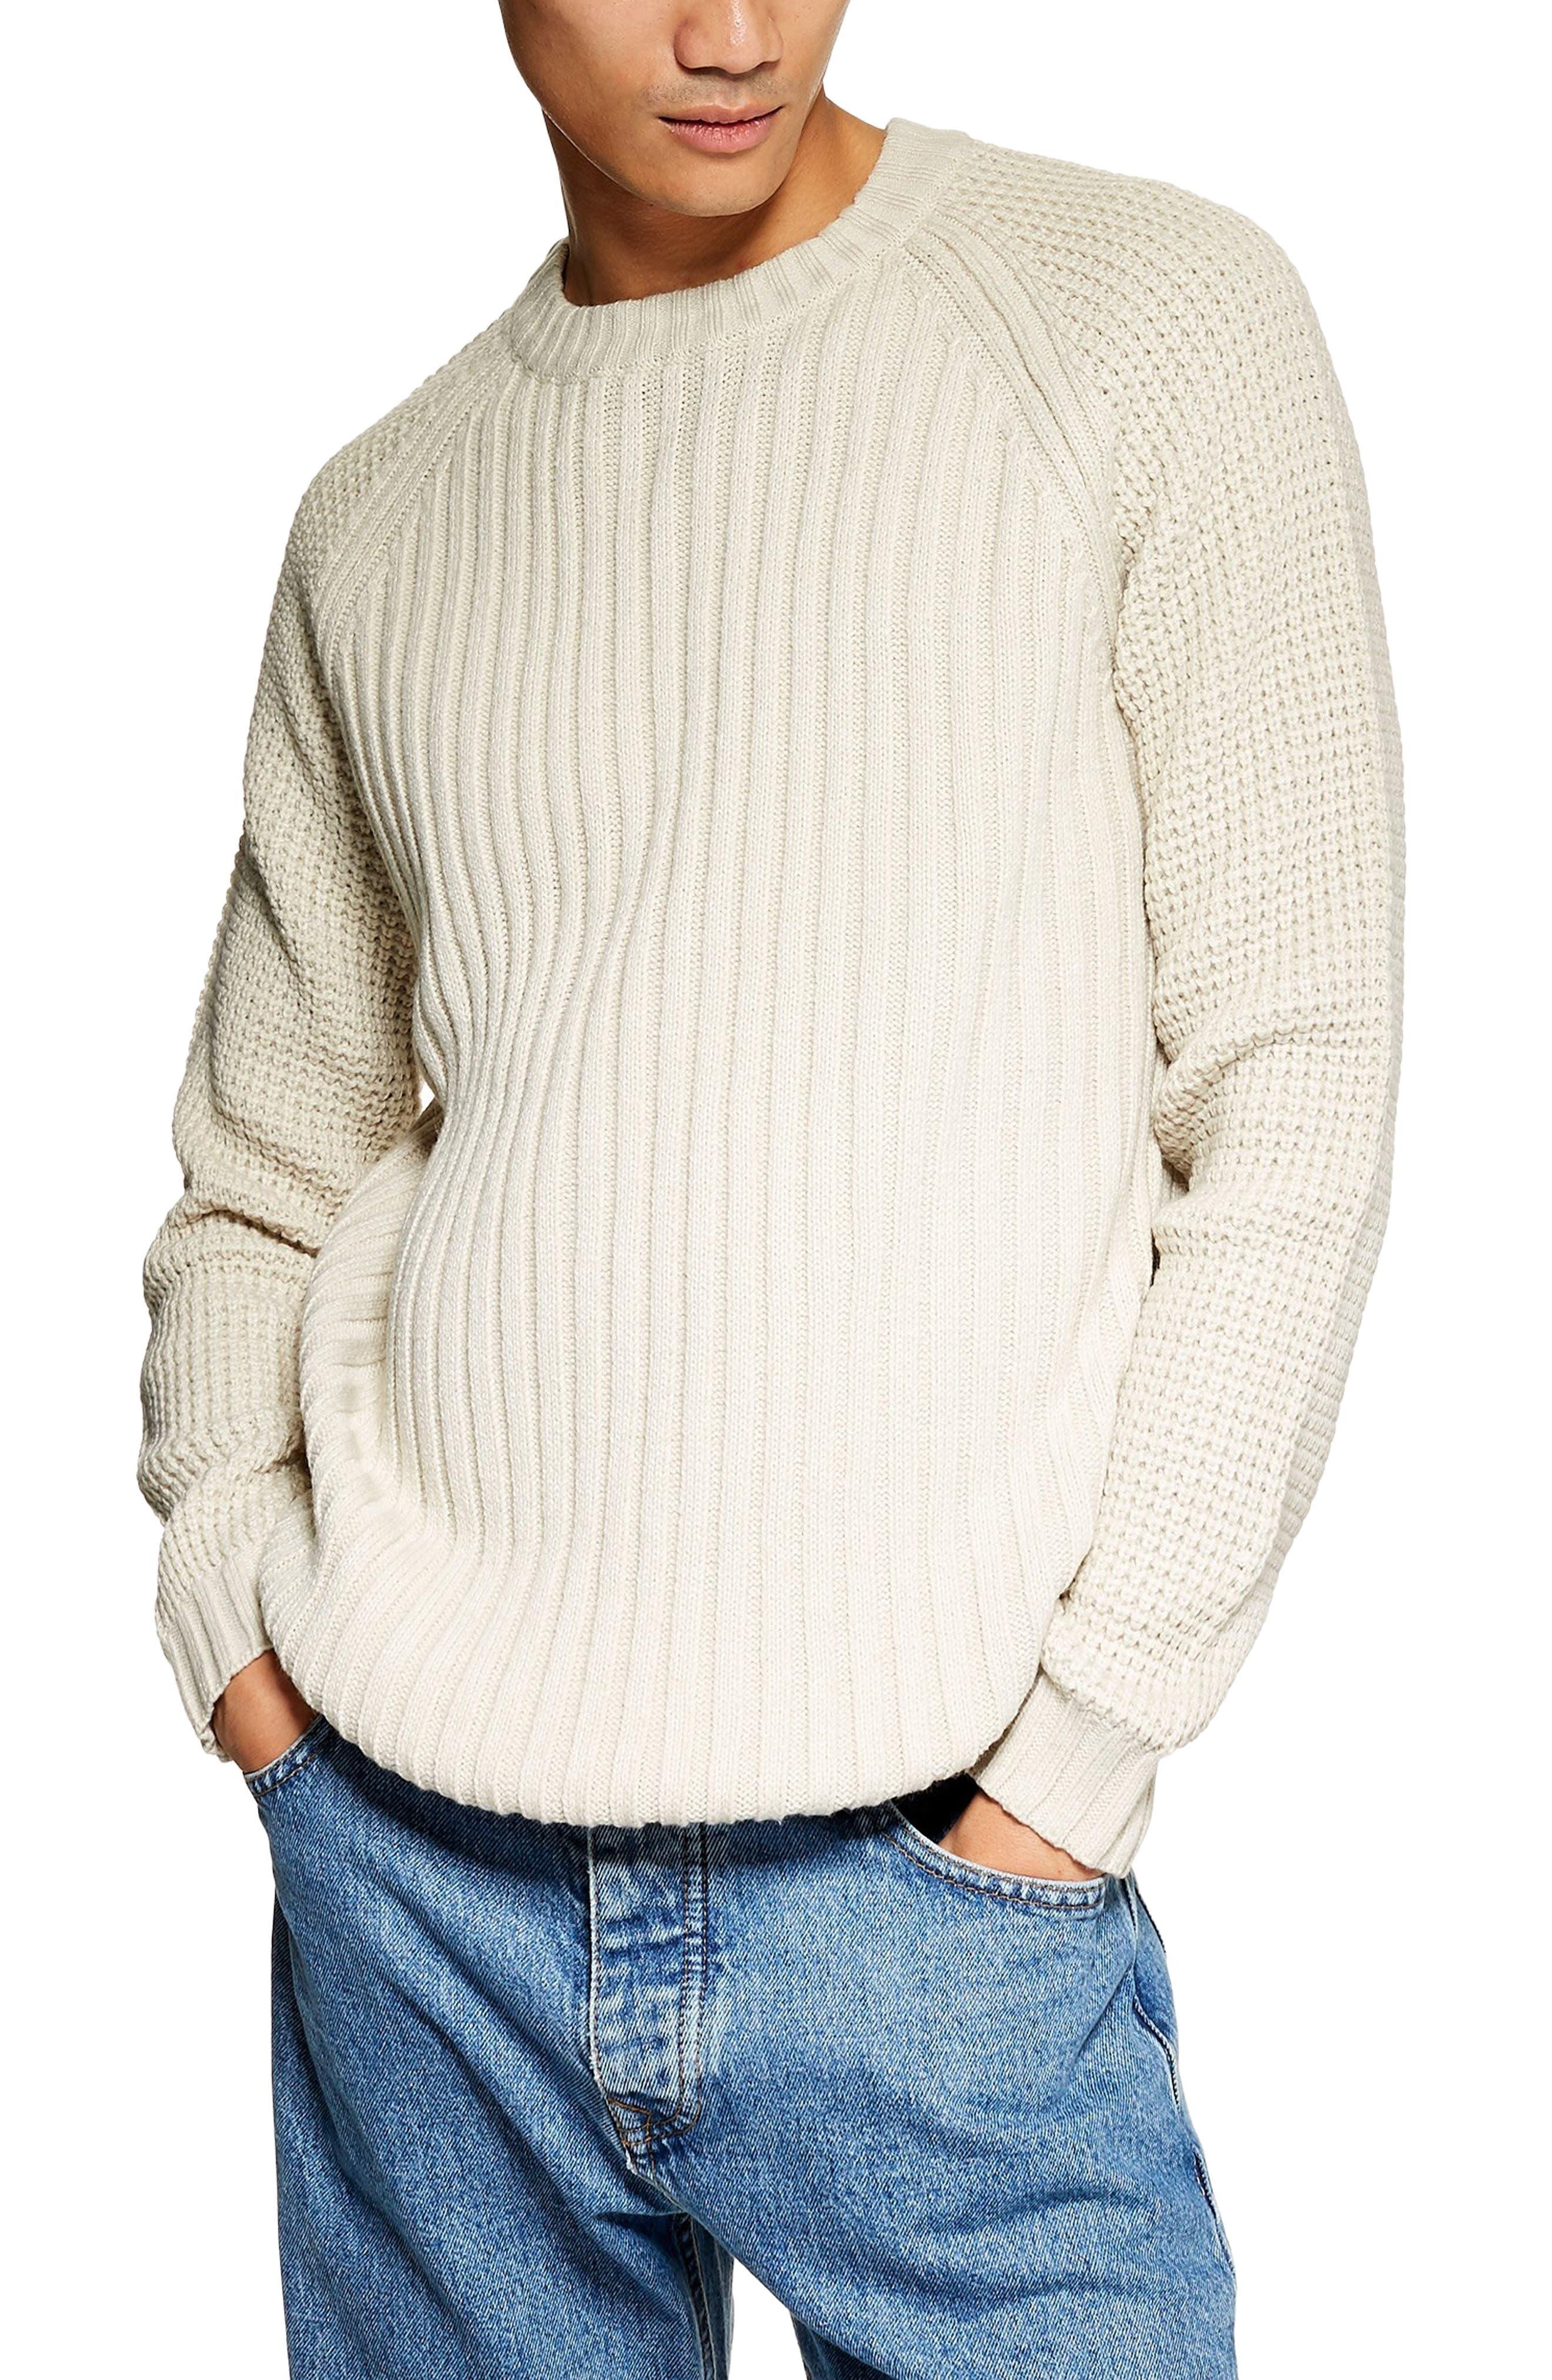 Mixed Stitch Classic Crewneck Sweater,                             Main thumbnail 1, color,                             STONE